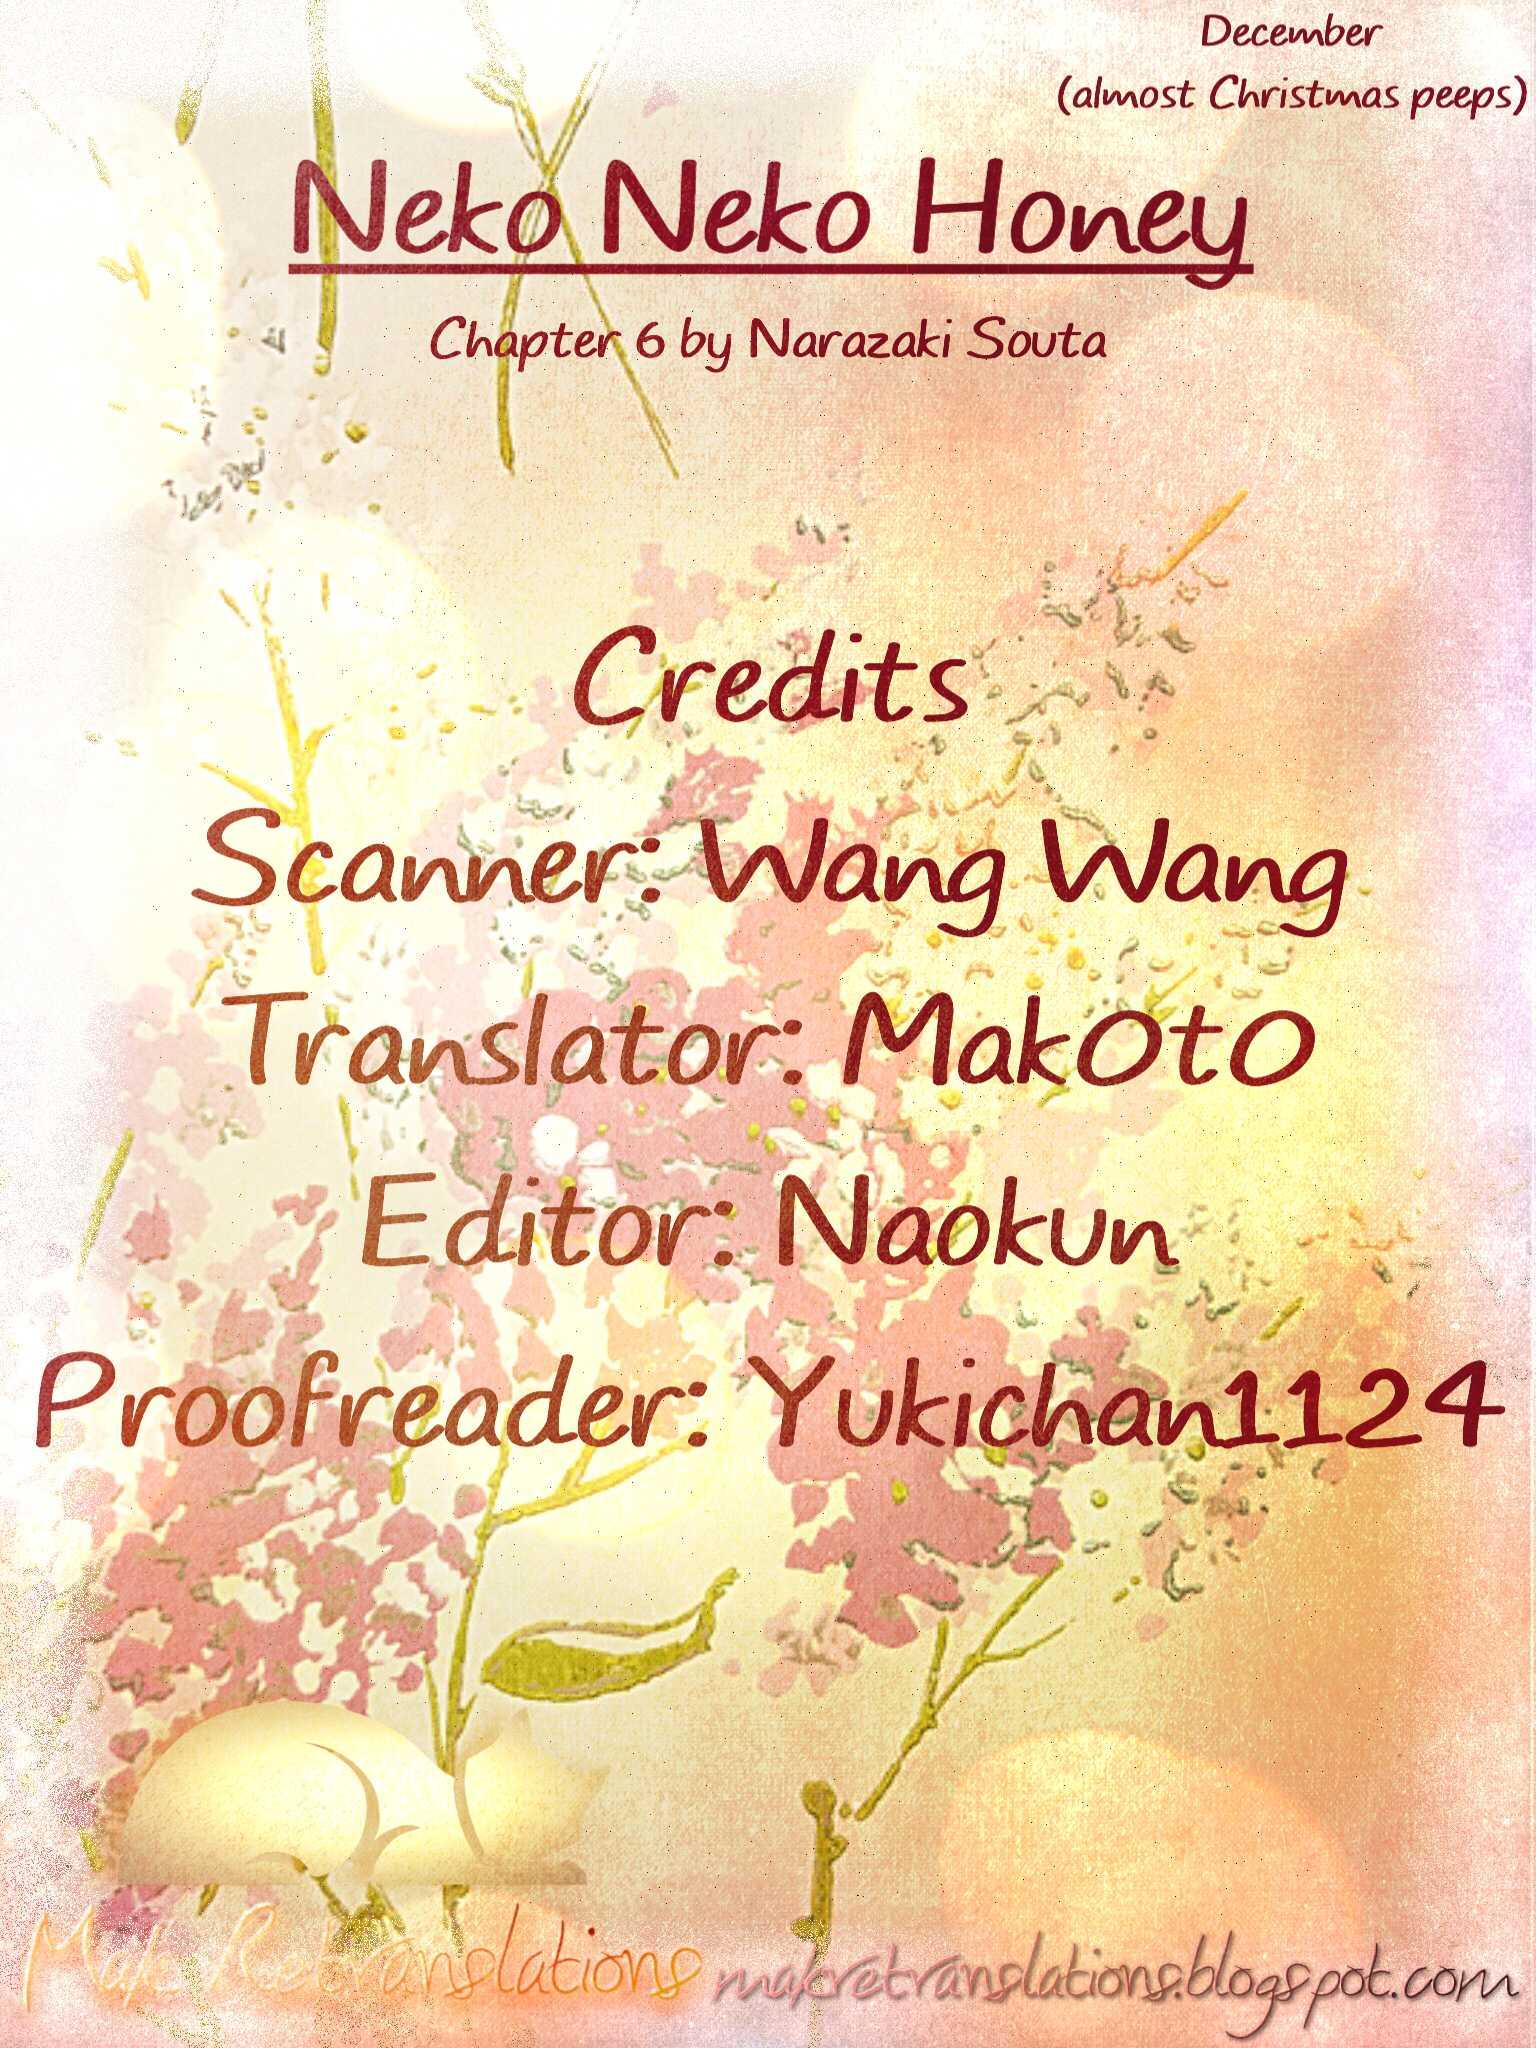 Neko Neko Honey - Chapter 8